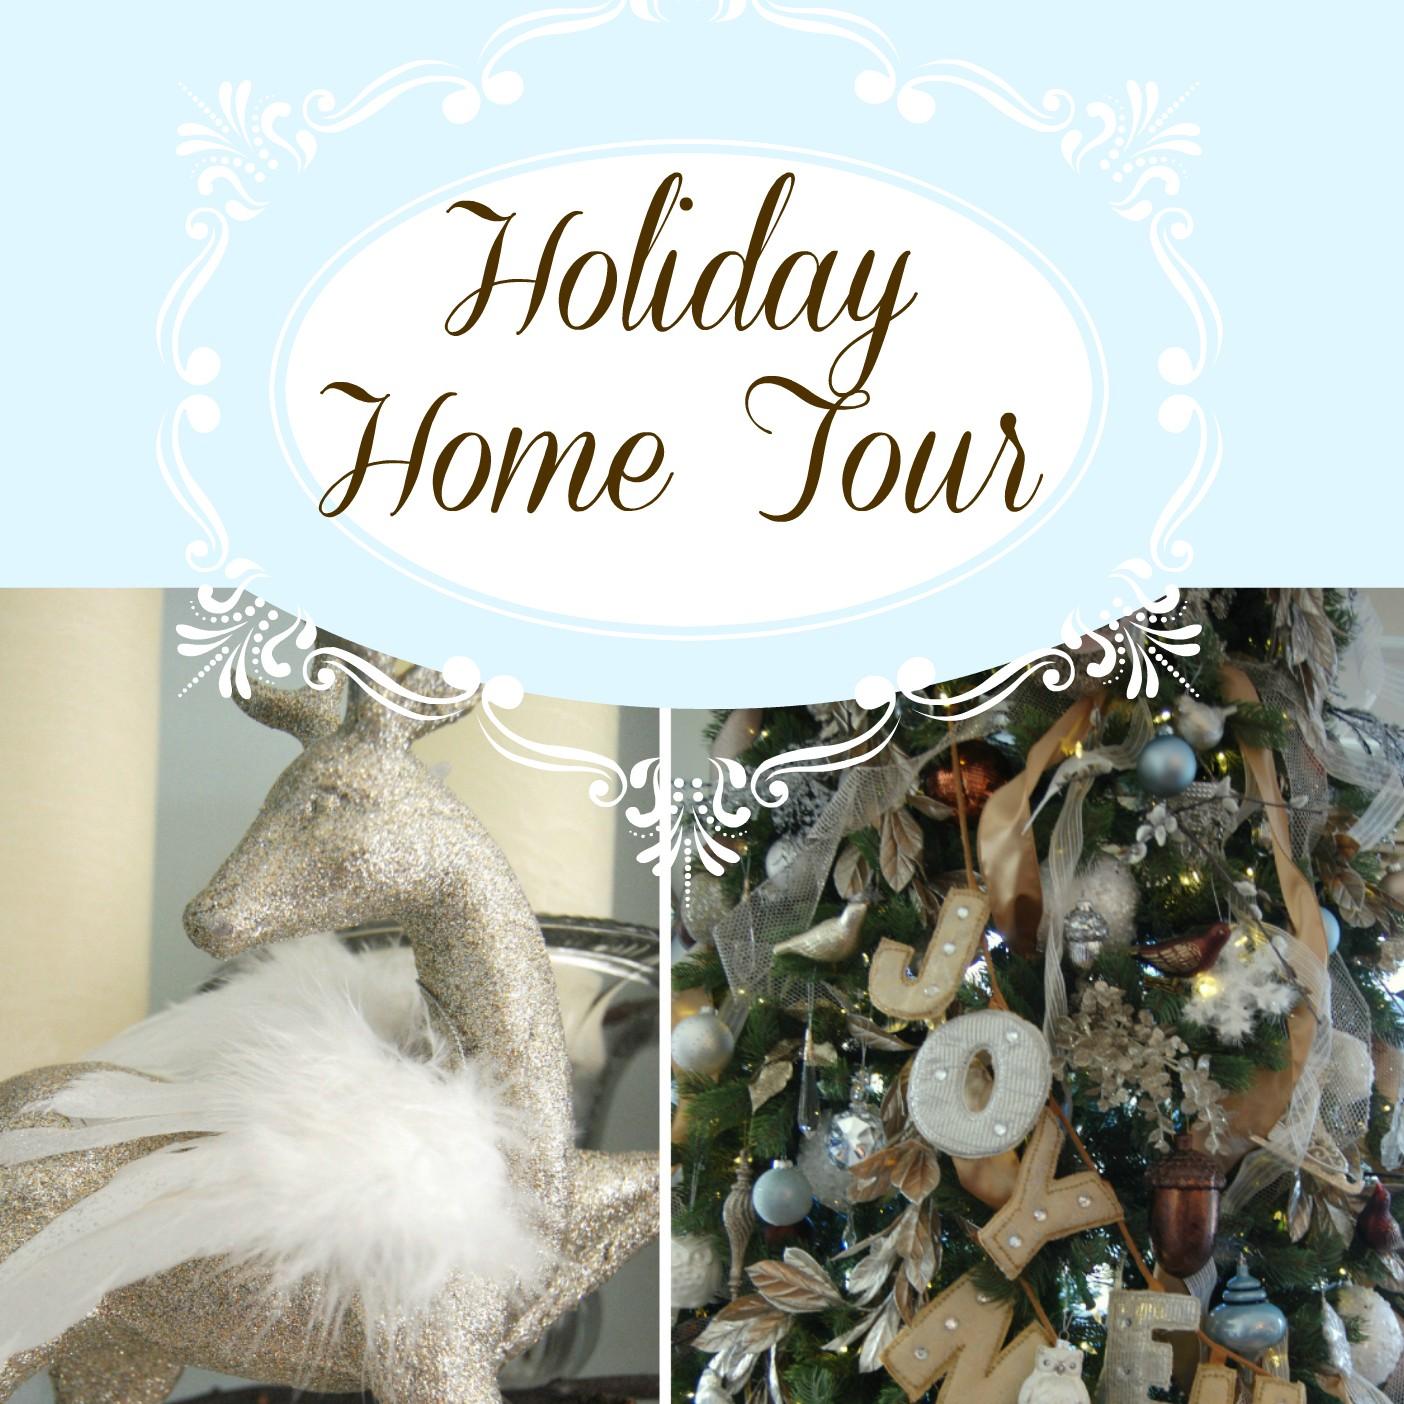 Holiday Home Tour 2012